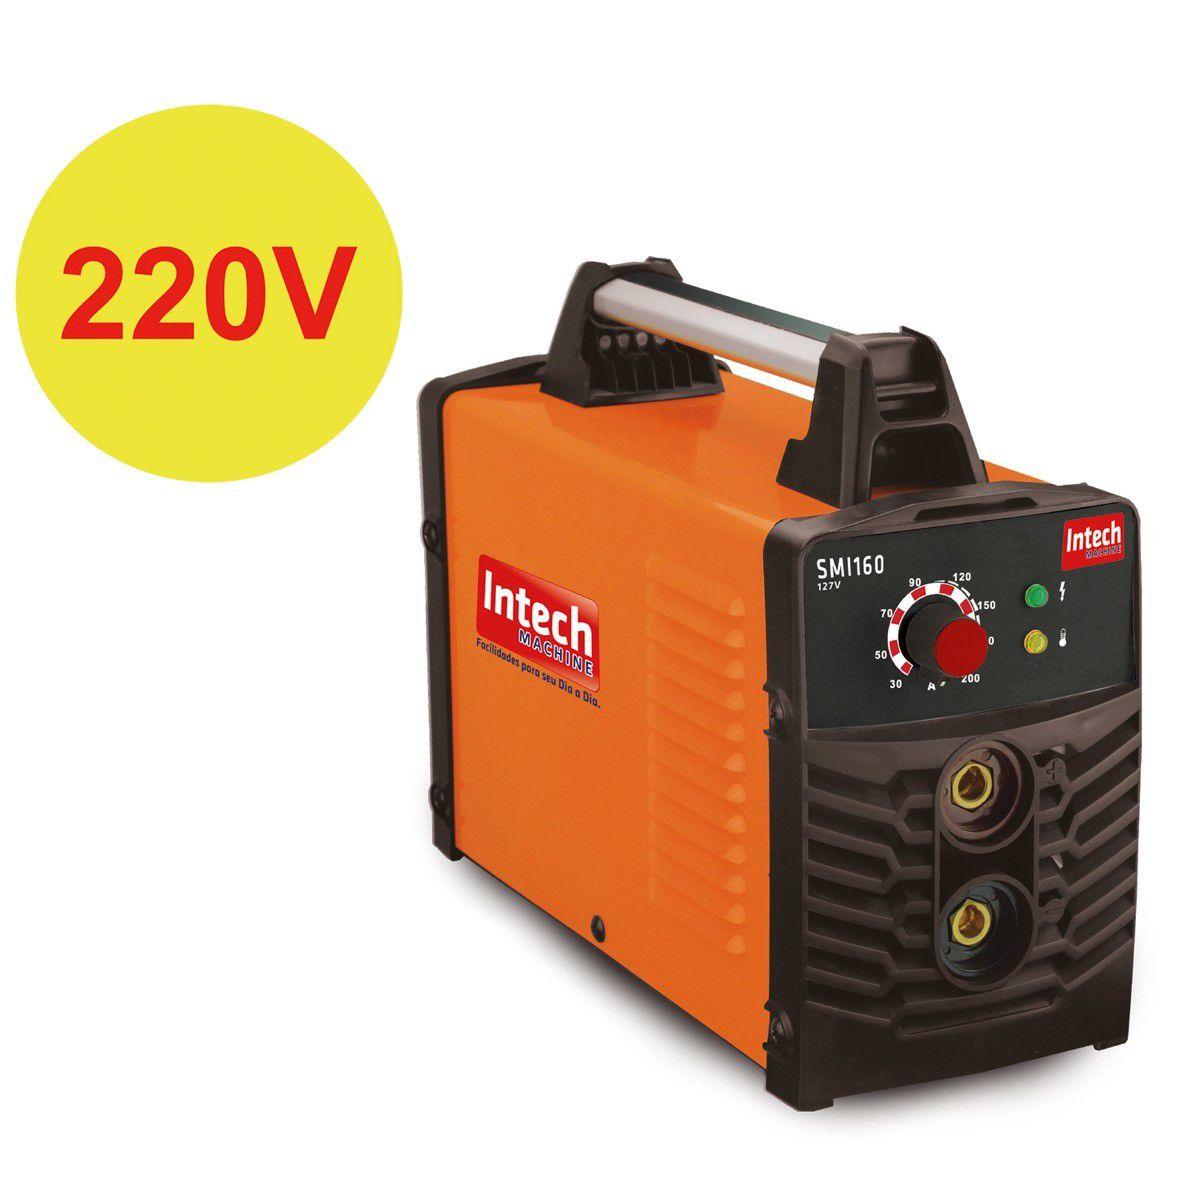 Maquina/Inversor Solda 160A 220V Intech Machine